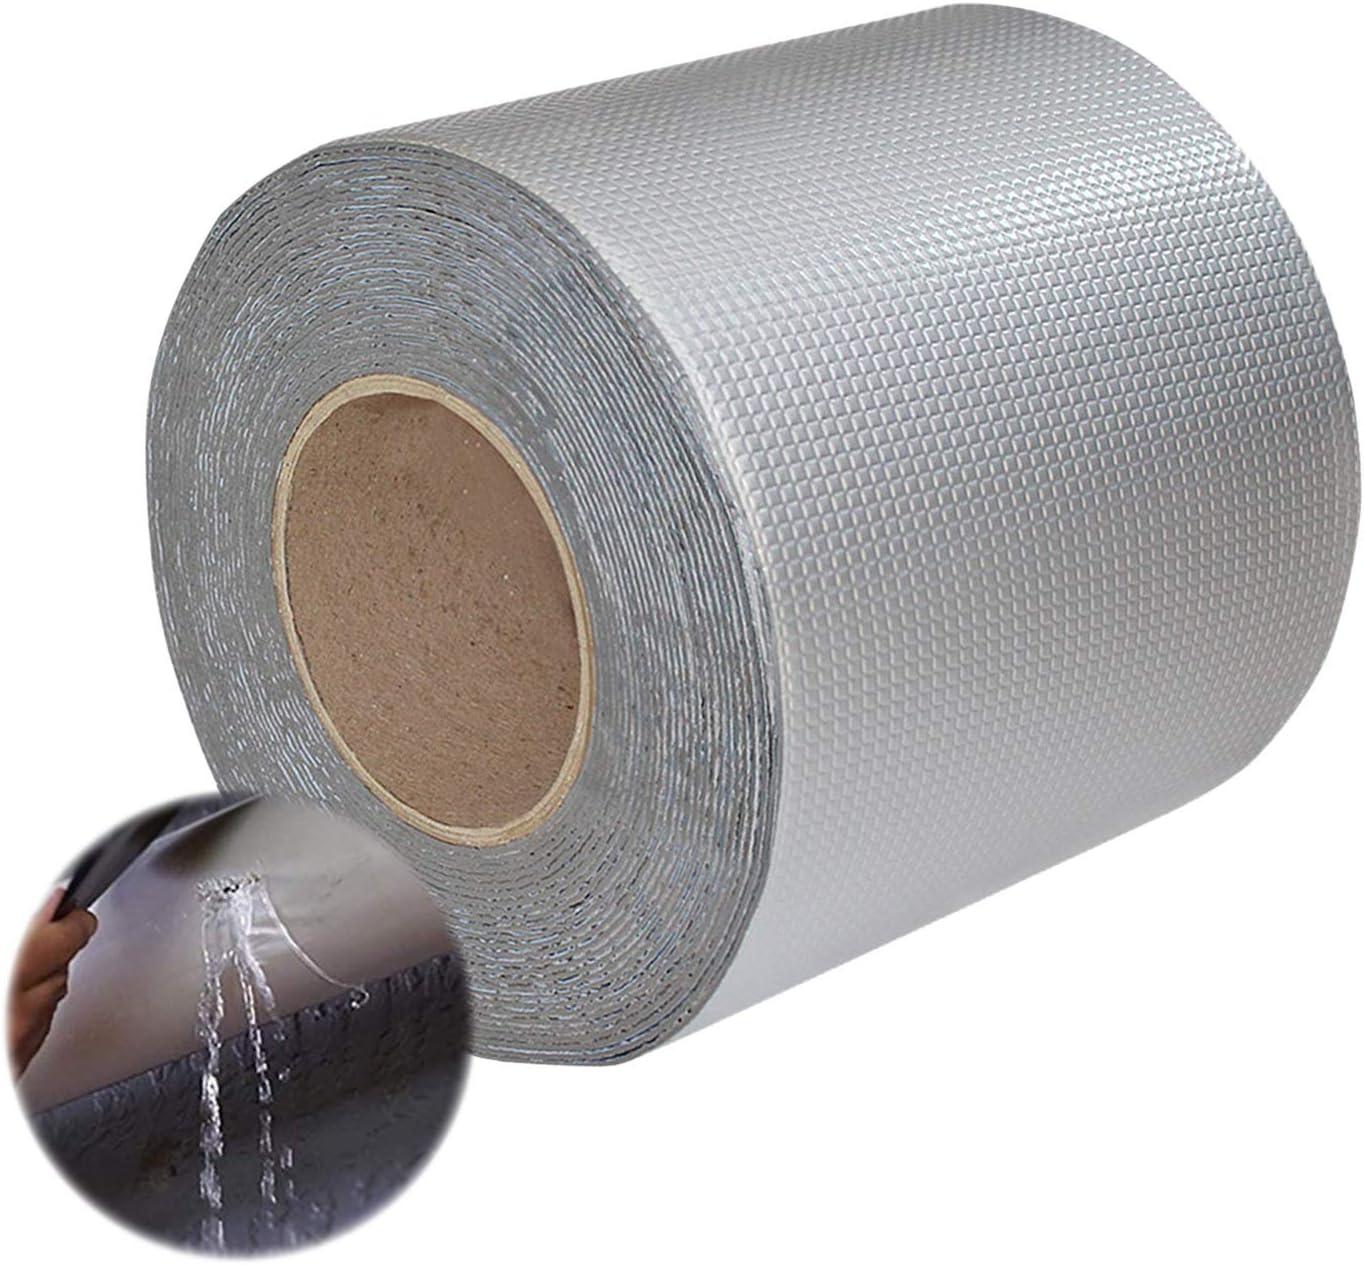 DIYH Foil Butyl Rubber Free shipping Waterproof Tape Upgra Nippon regular agency Sealing